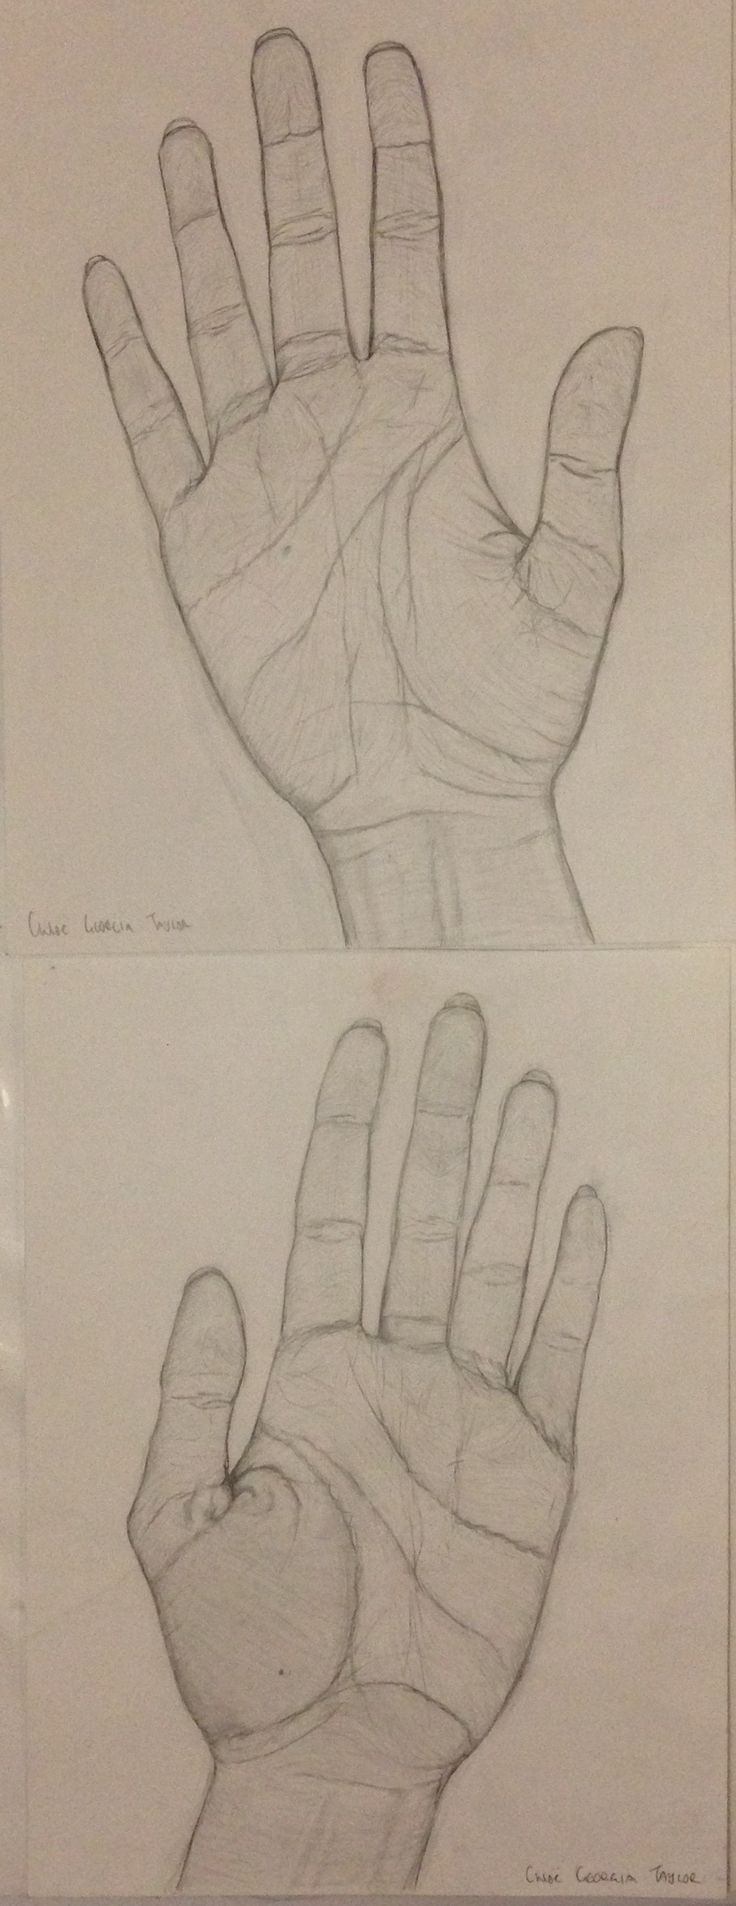 Chloë Georgia Taylor, my hands